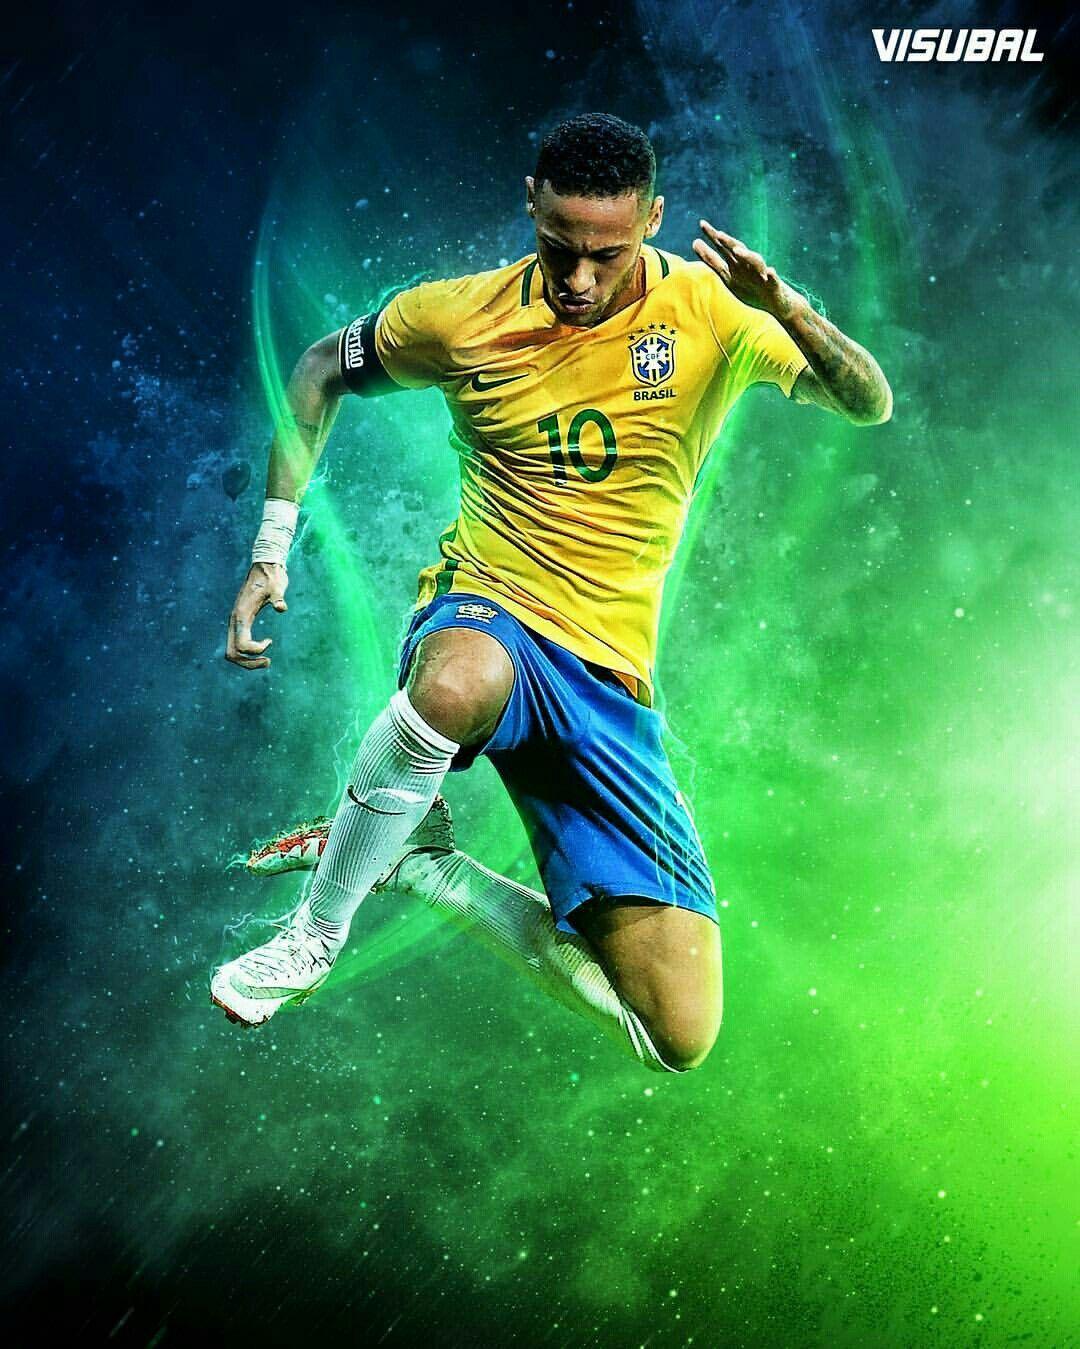 Neymar Jr. For Brazil: 74 Games 50 Goals 30 Assists And He